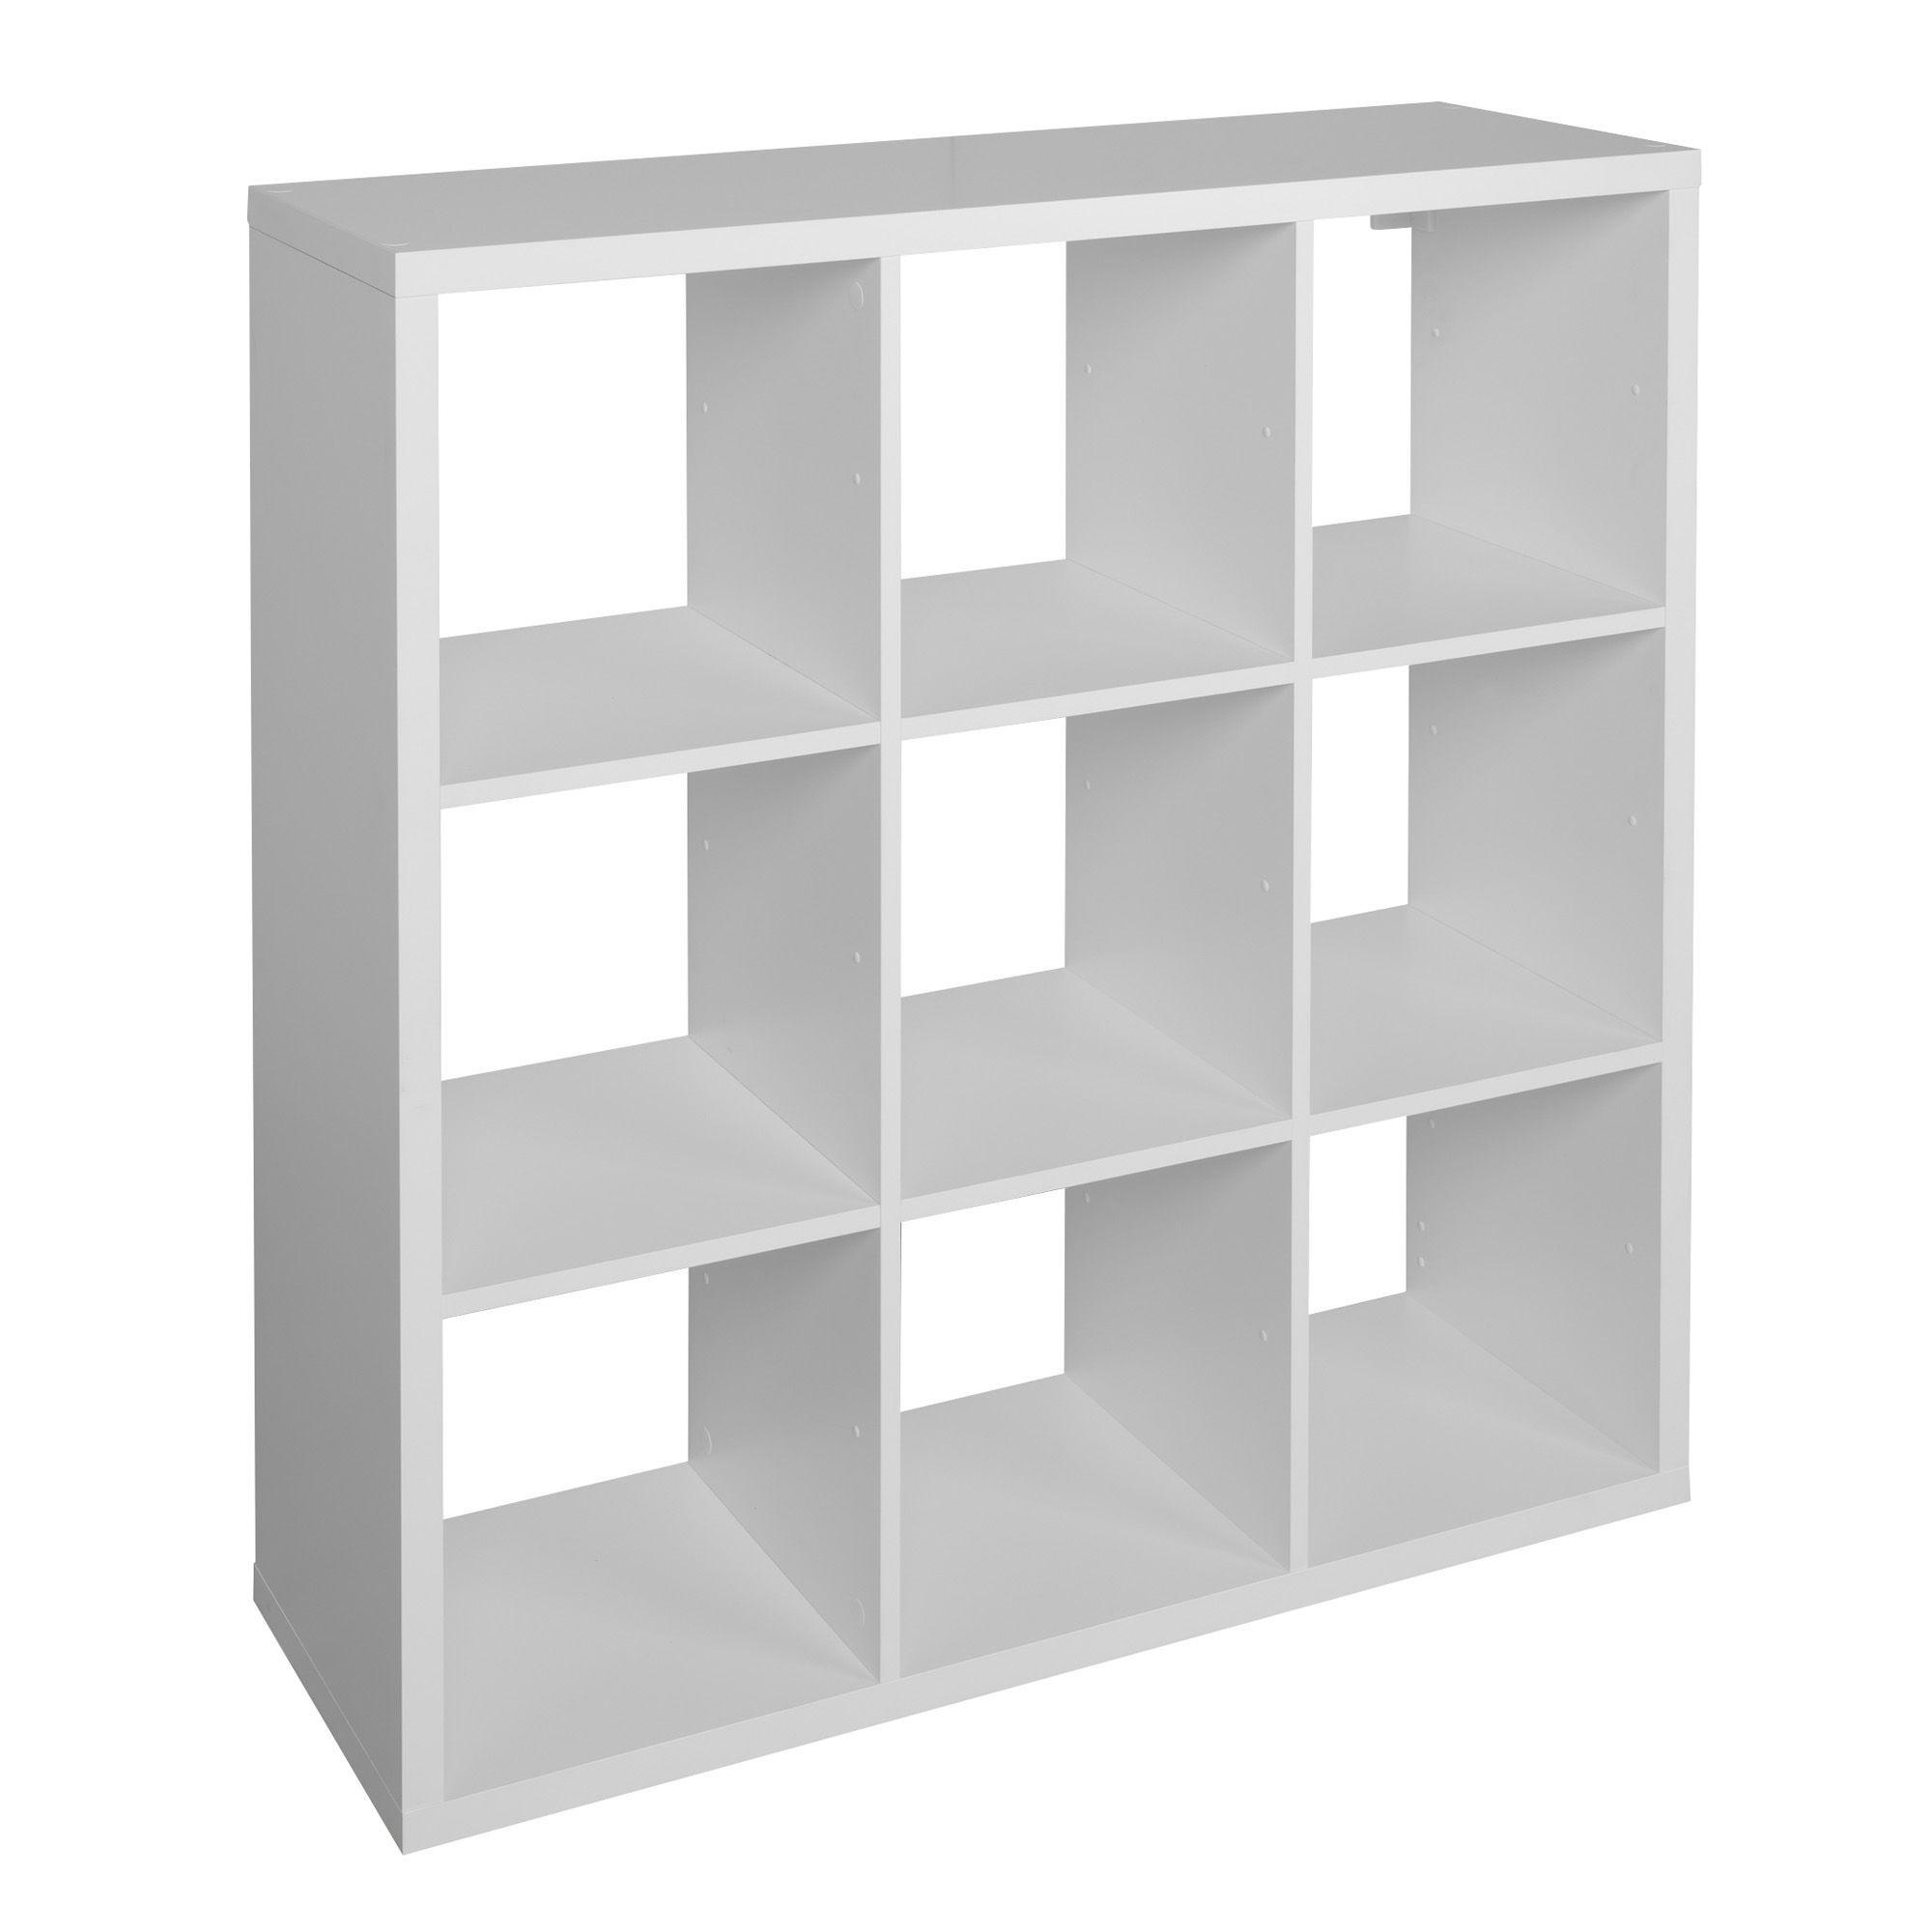 Form Mixxit White 9 Cube Shelving Unit H 1080mm W 1080mm